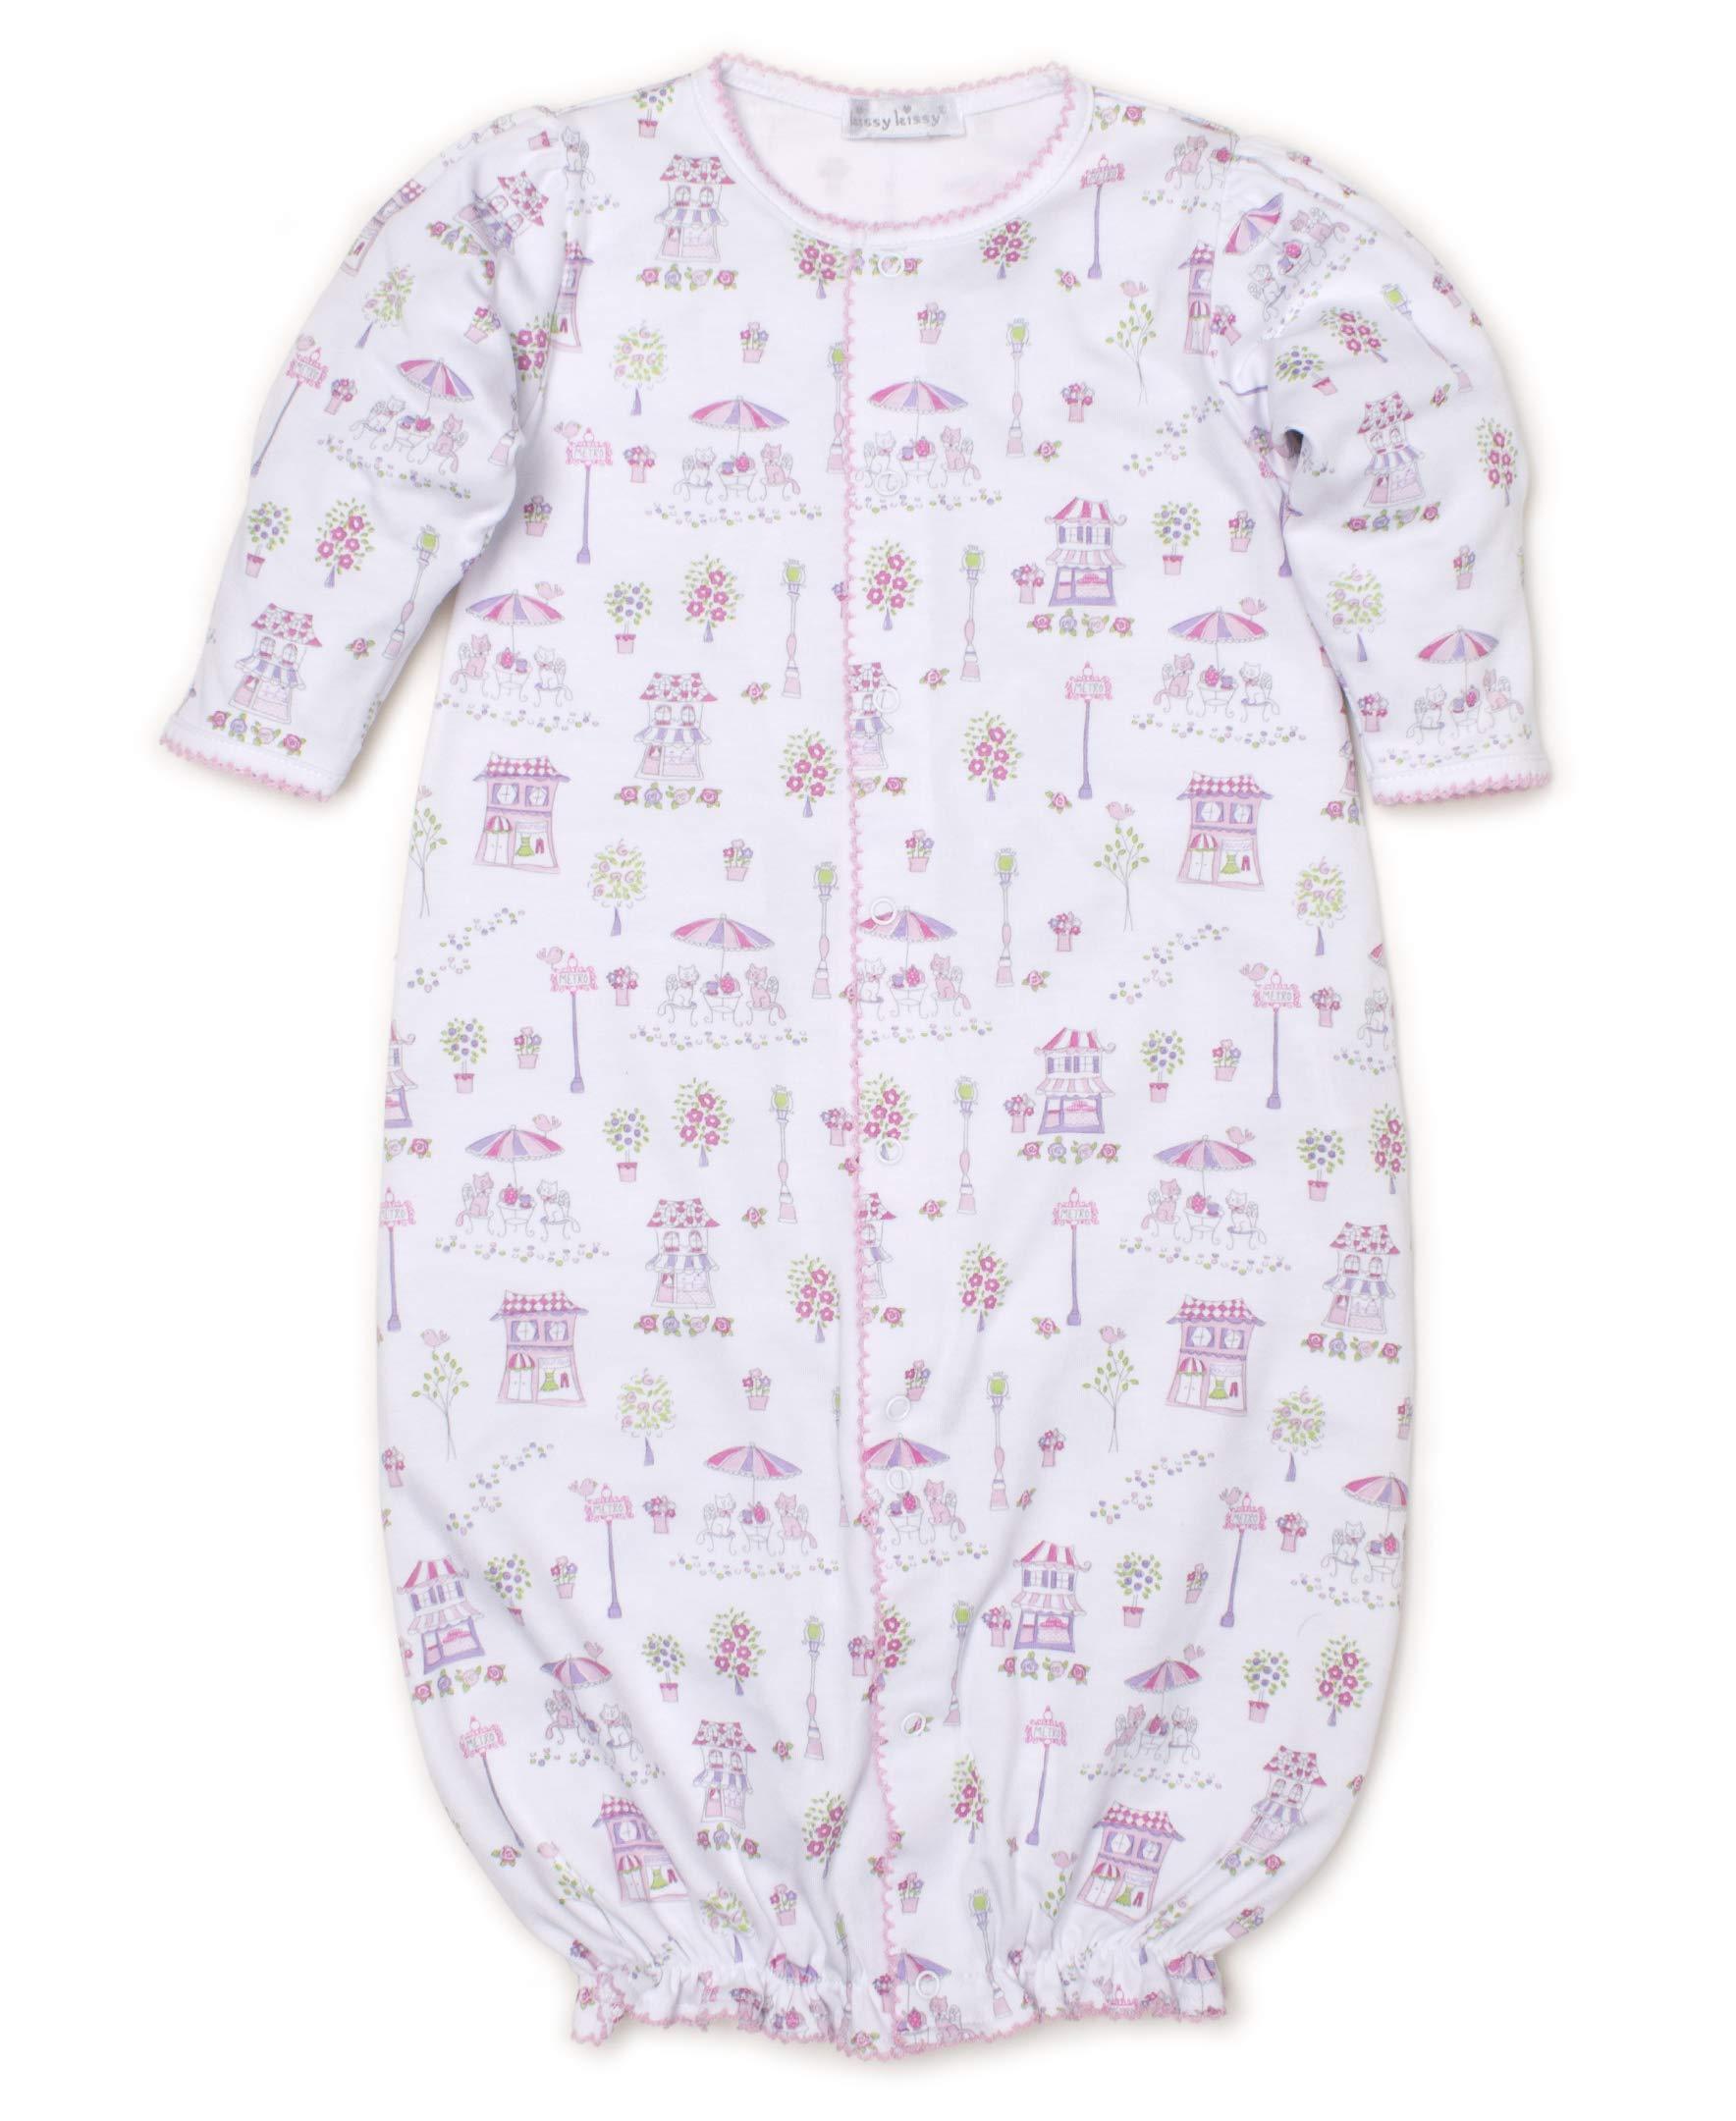 Kissy Kissy Baby-Girls Infant Parisian Promenade Print Convertible Gown-Pink-Small by Kissy Kissy